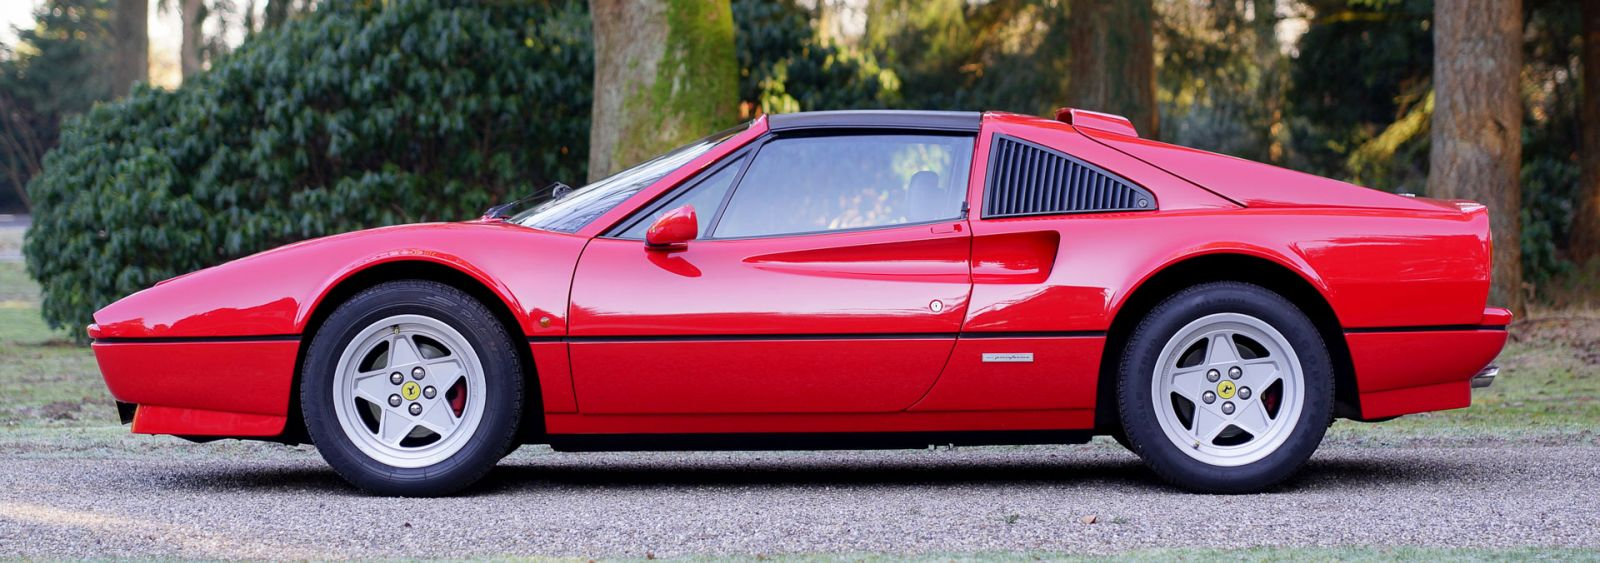 Ferrari 328 GTS, 1985